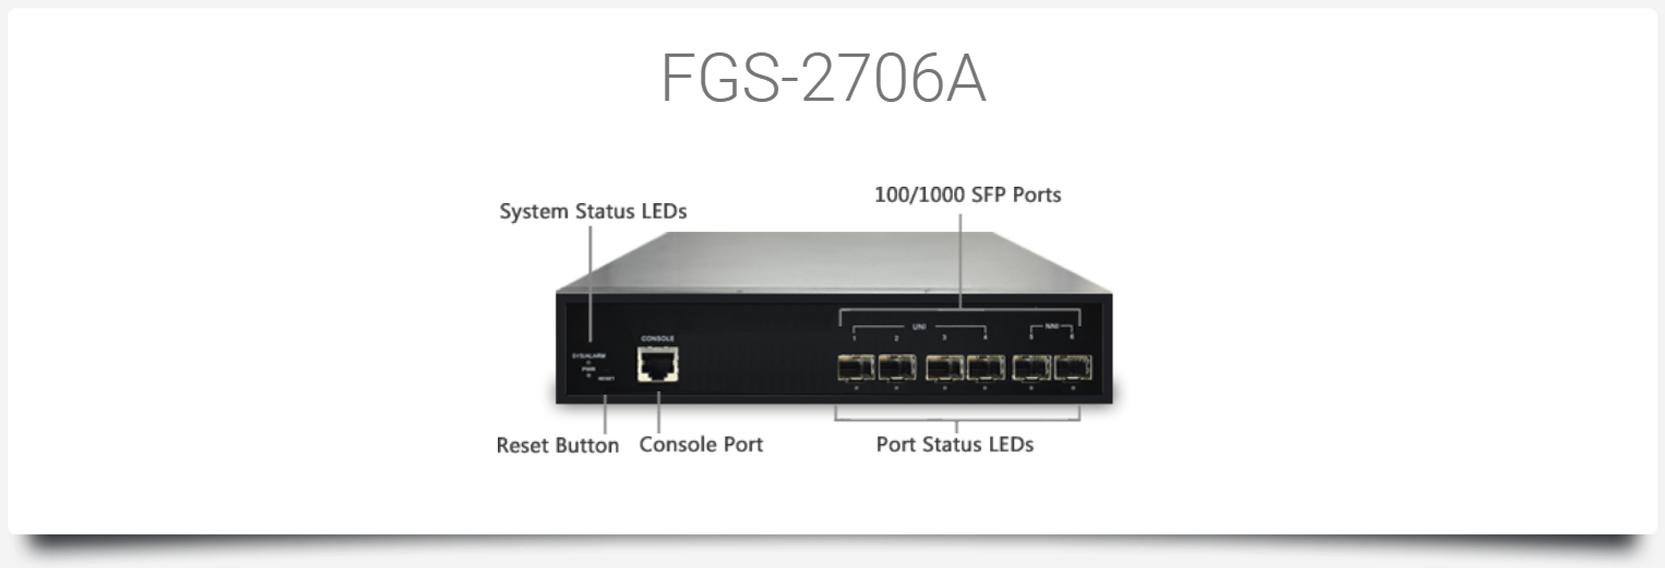 FGS-2706A